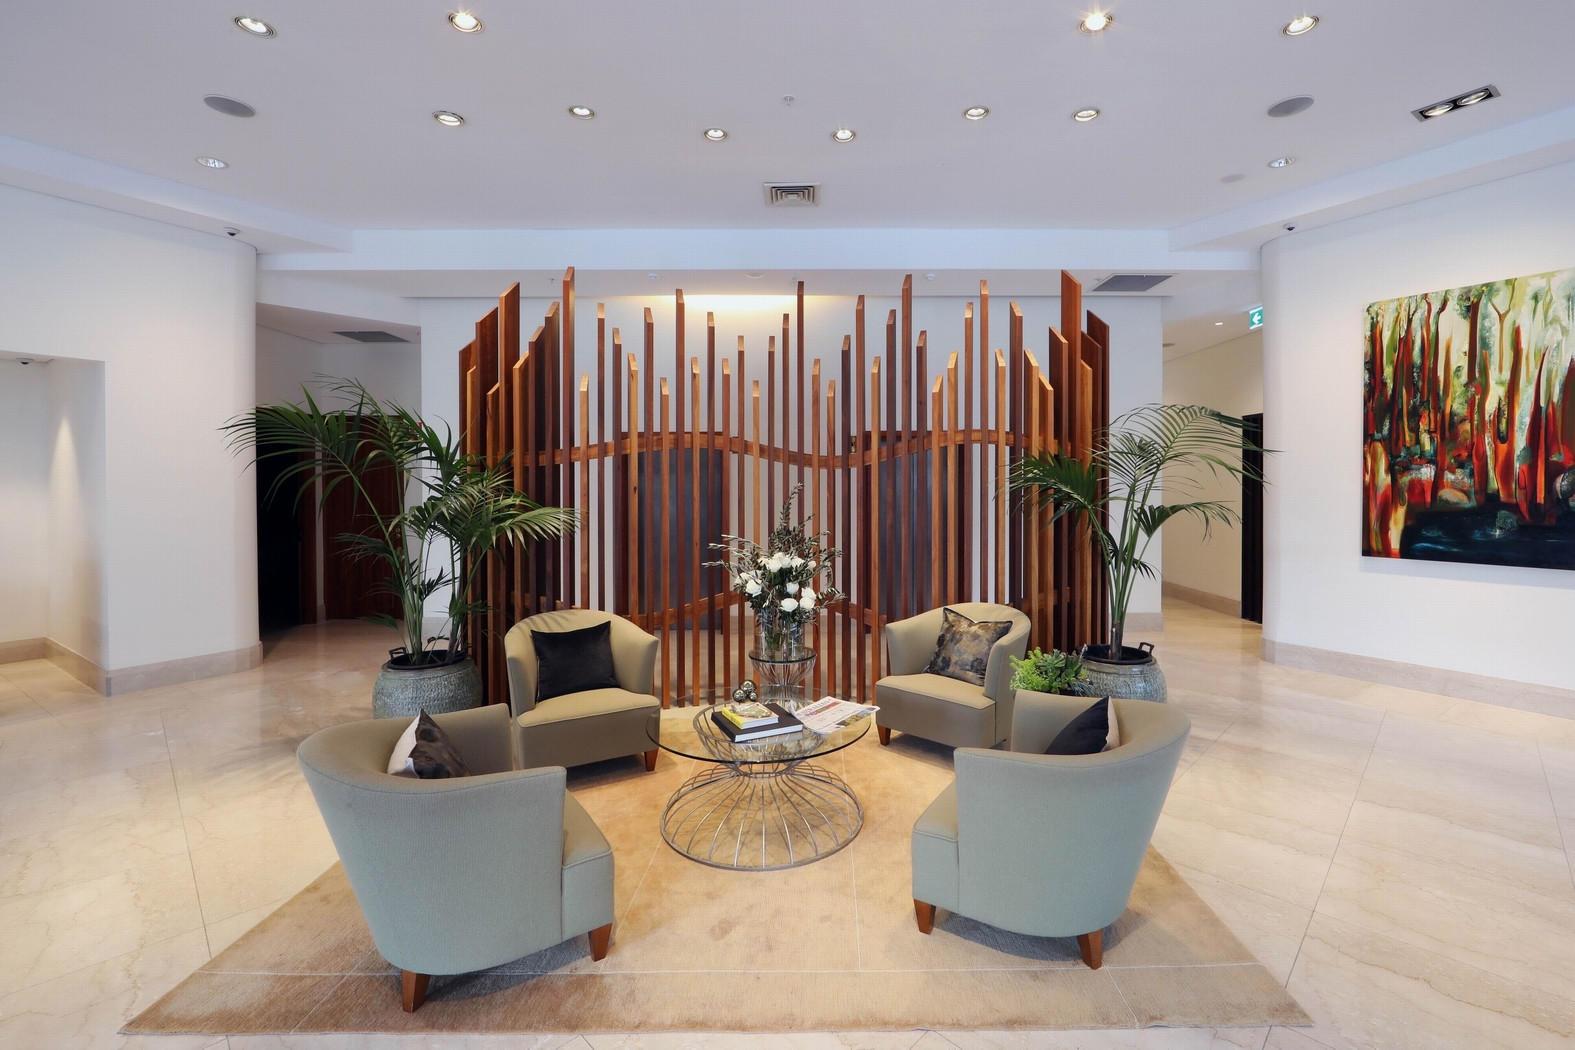 YSK Furniture factory price retirement home furniture health senior age-1